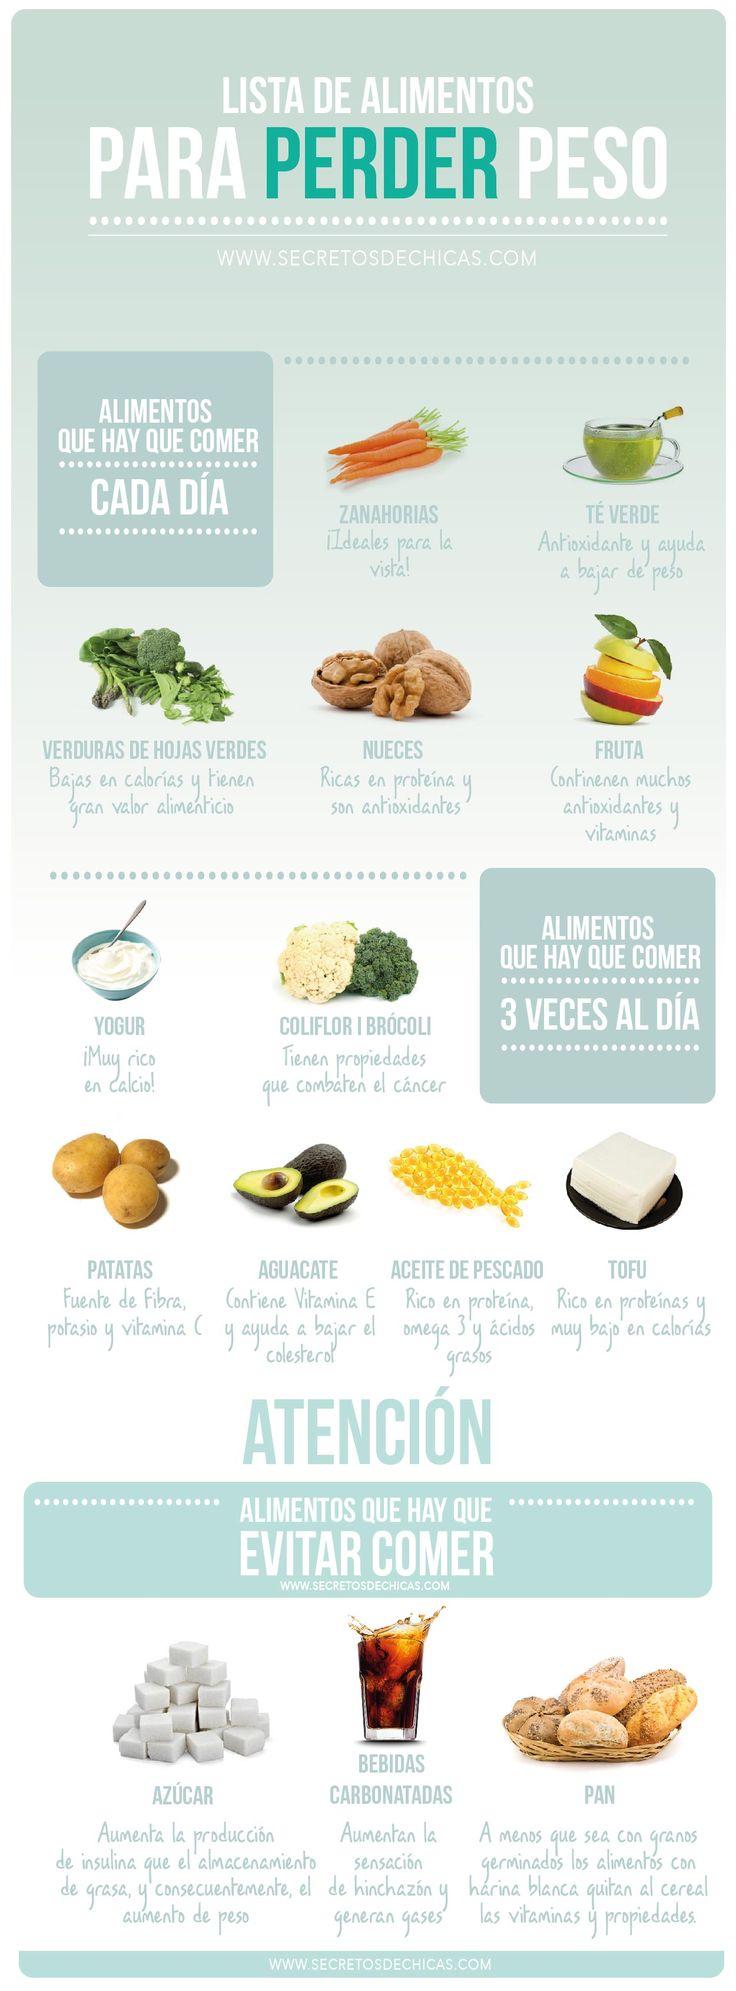 alimentos para perder peso